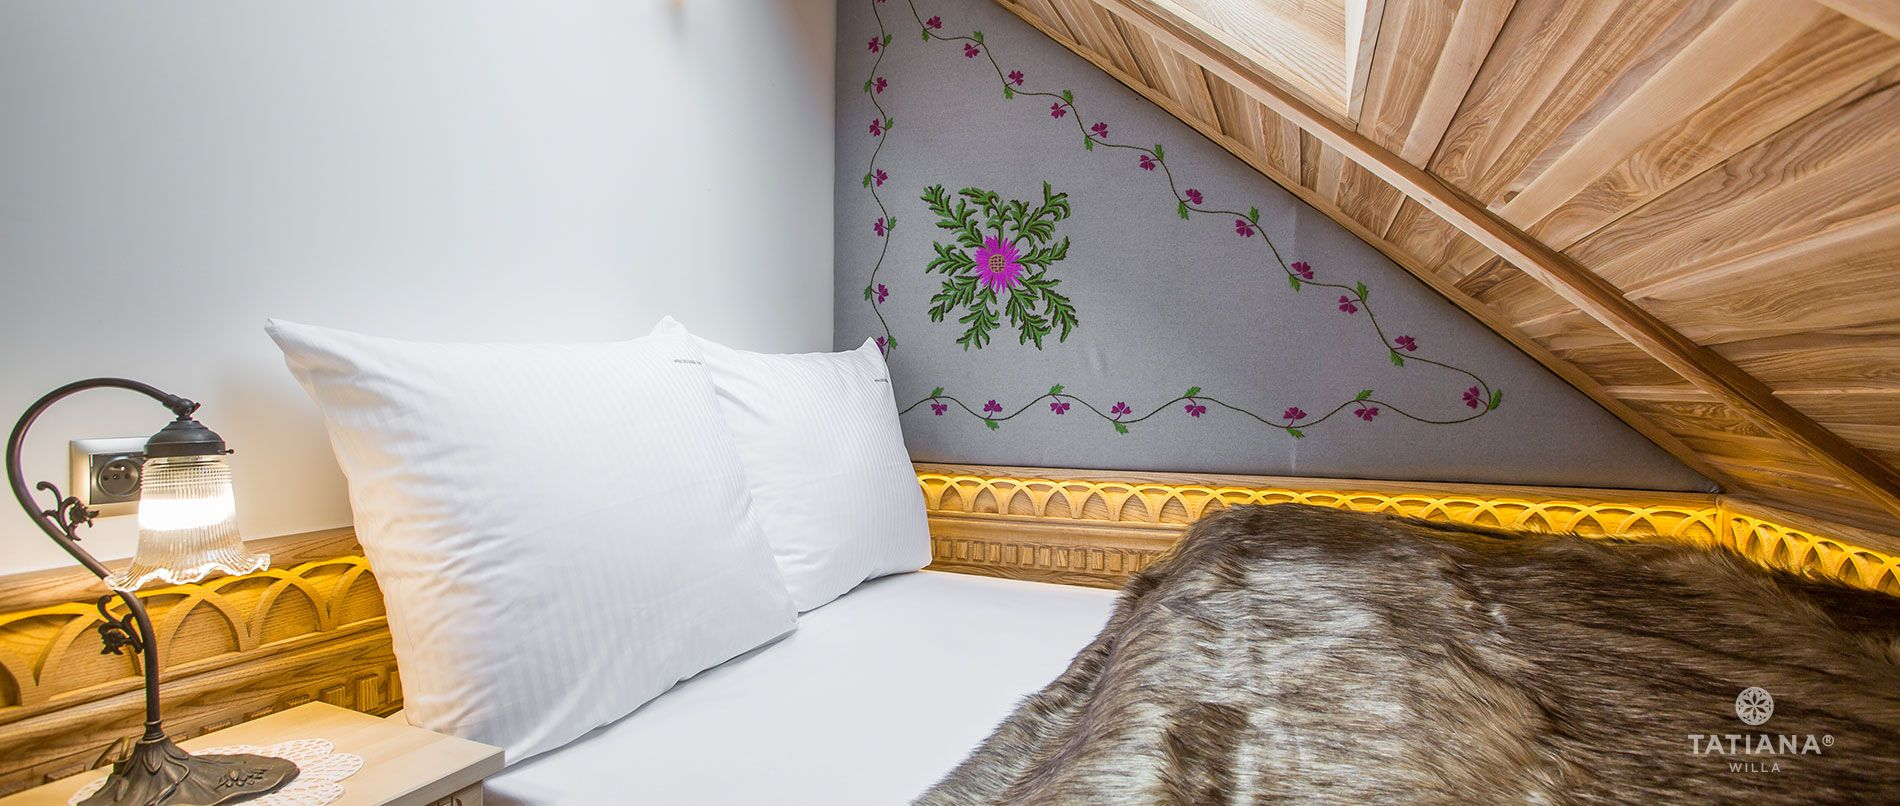 Apartament Tatrzański - druga sypialnia